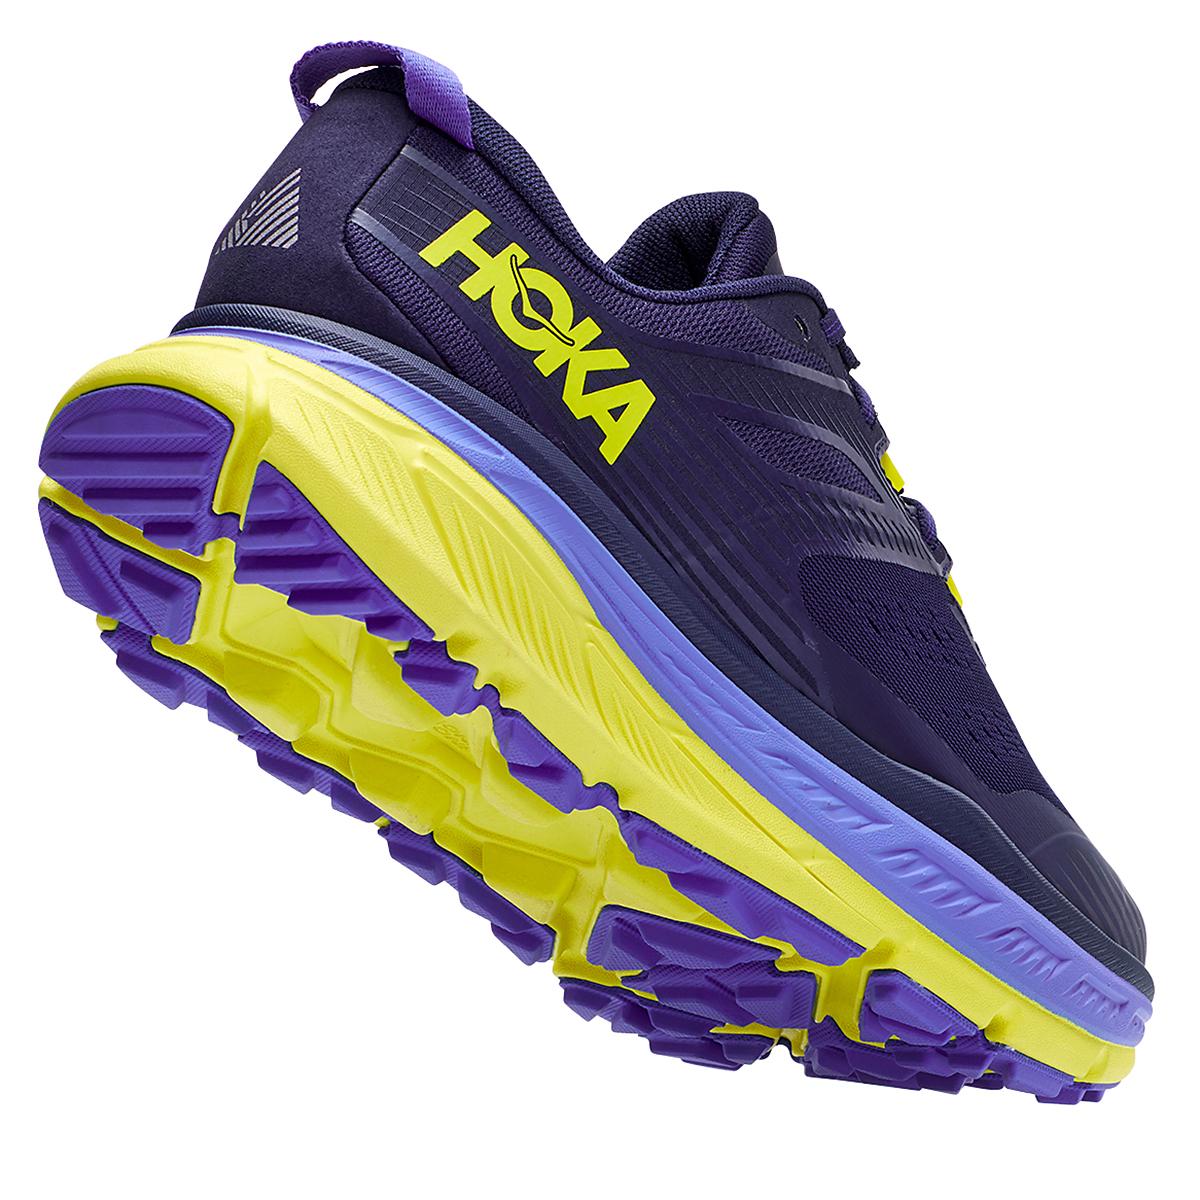 Men's Hoka One One Stinson Atr 6 Trail Running Shoe - Color: Black Iris/Evening Primrose - Size: 7 - Width: Regular, Black Iris/Evening Primrose, large, image 5